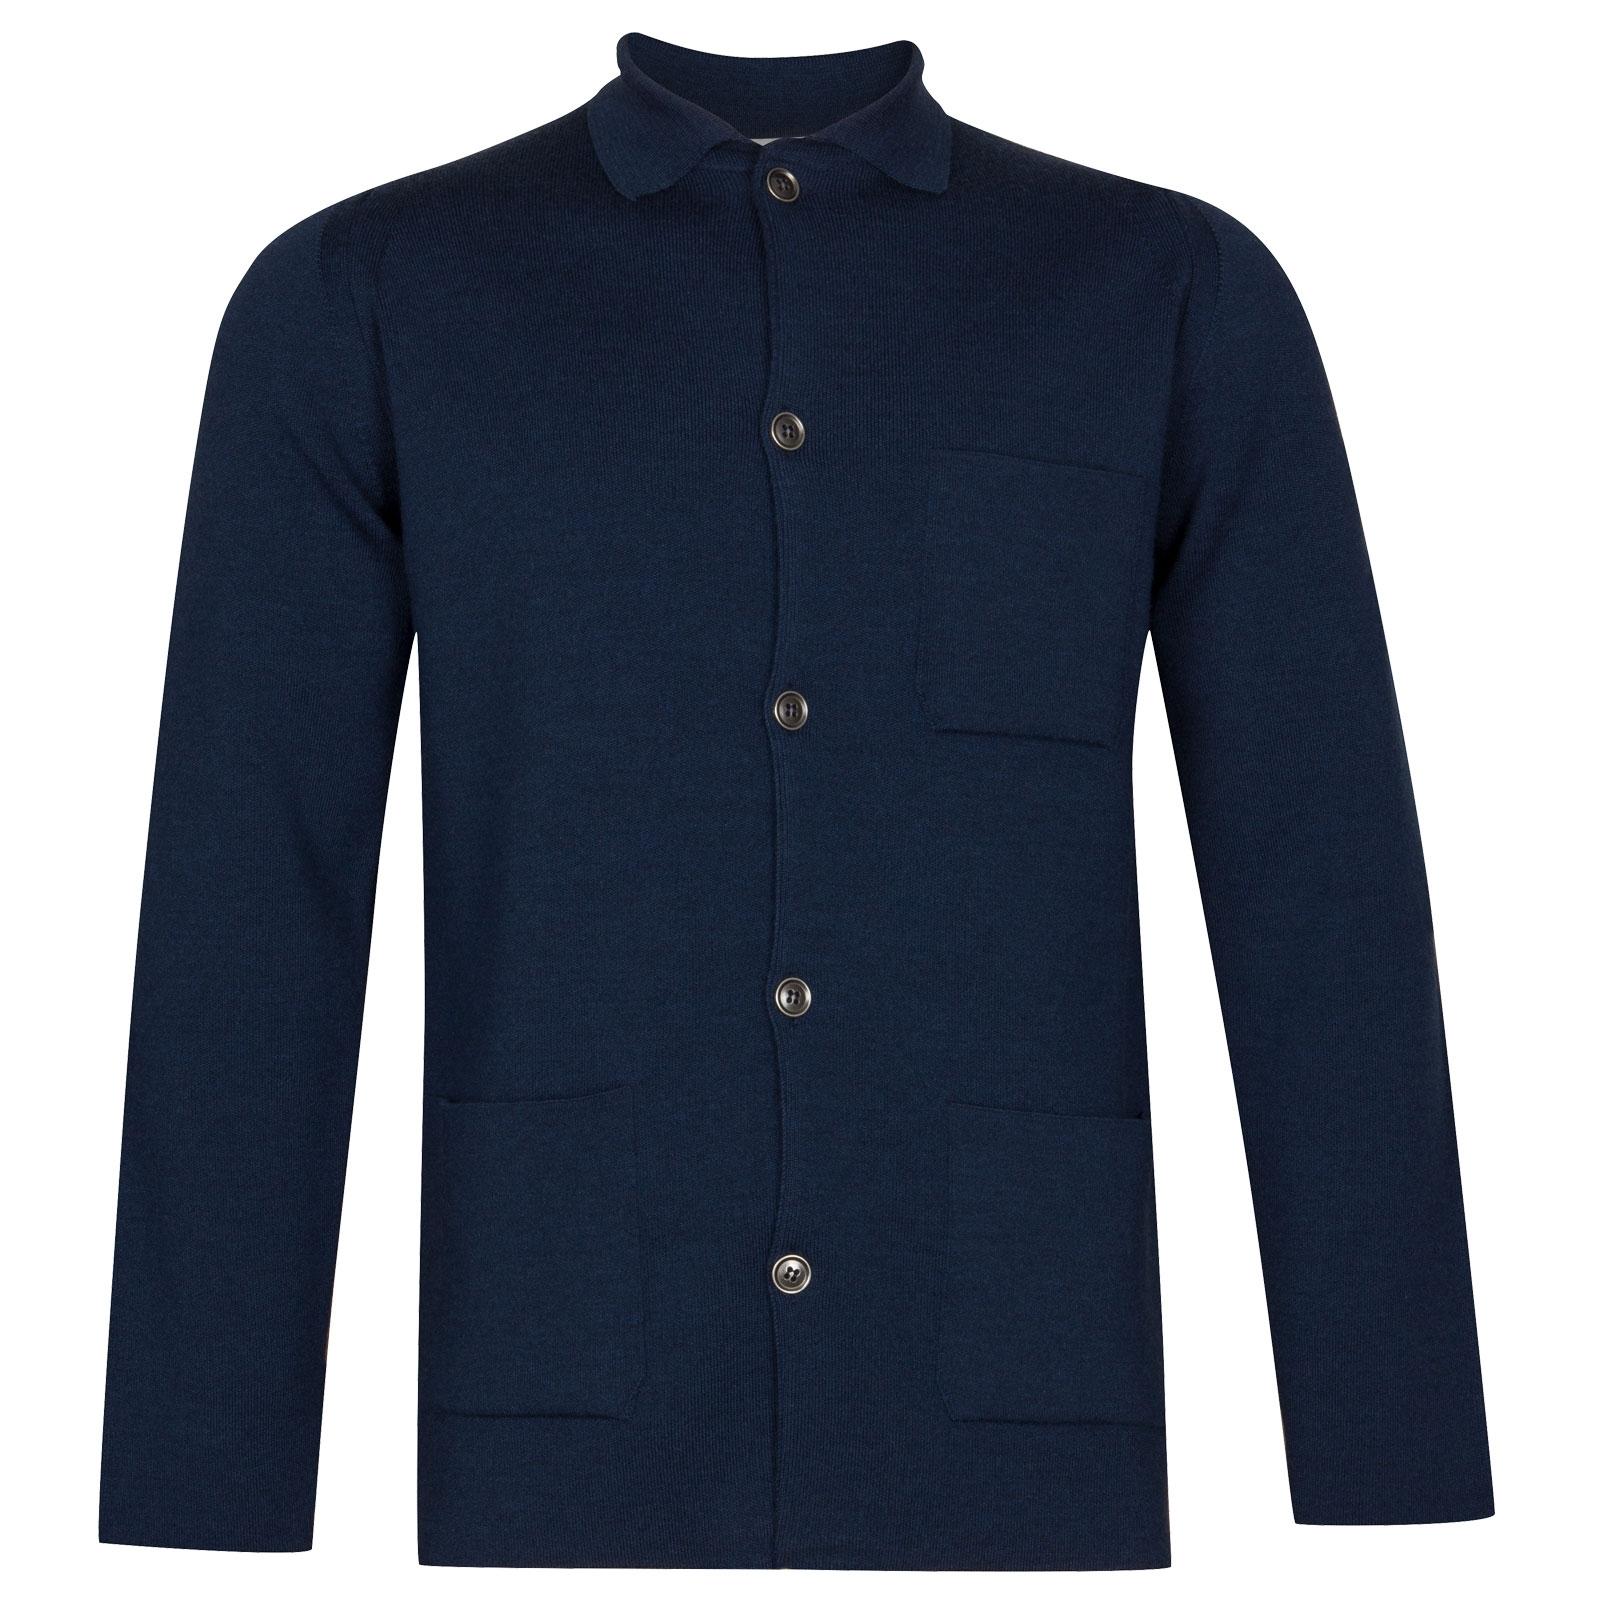 John Smedley Copper Merino Wool Jacket in Indigo-S